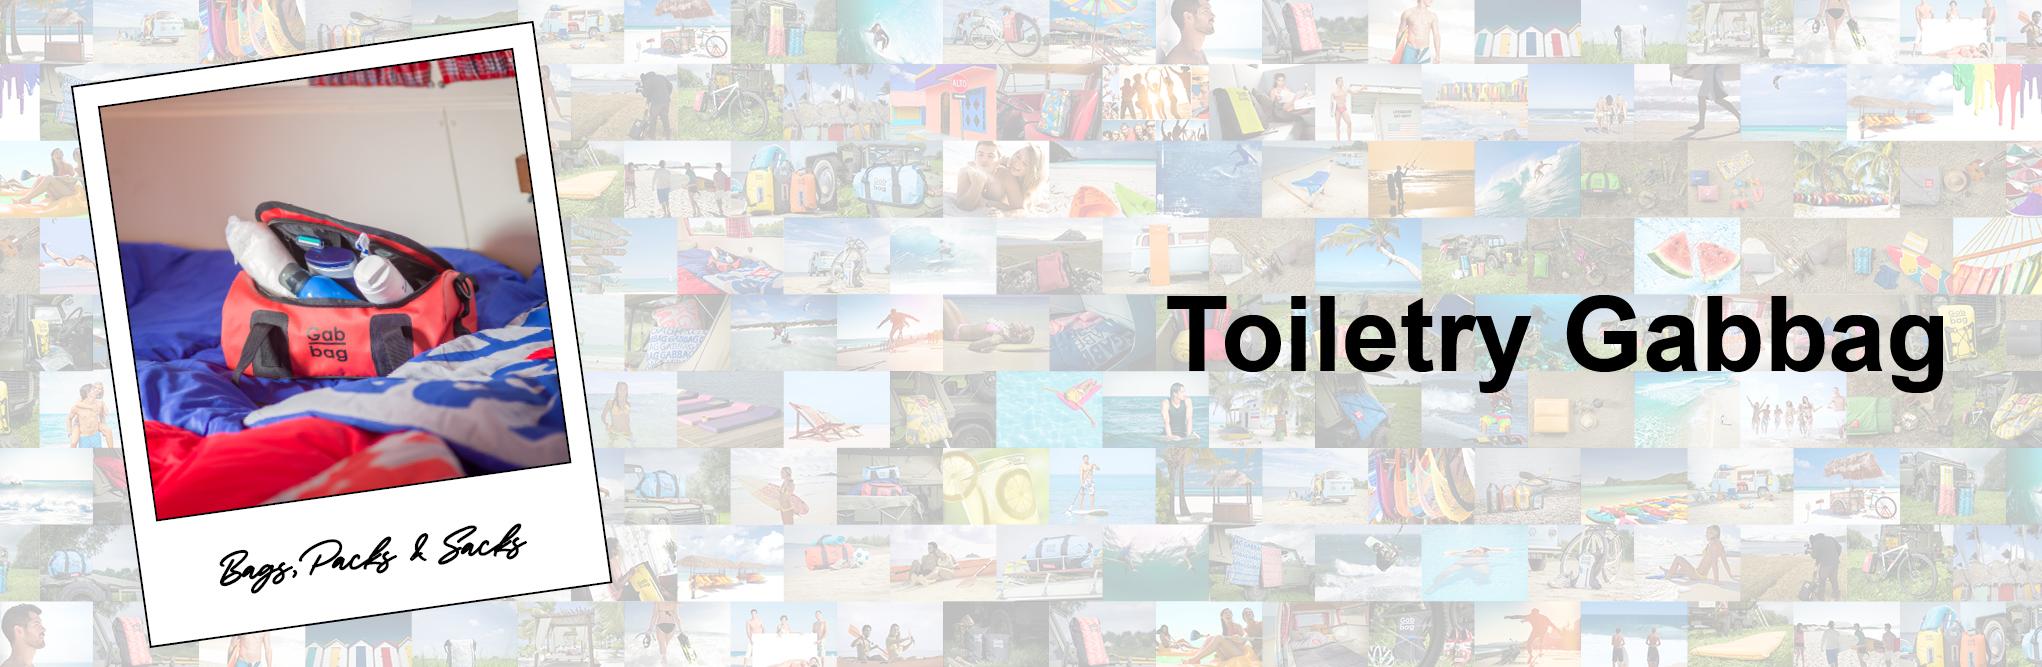 Toiletry Gabbag